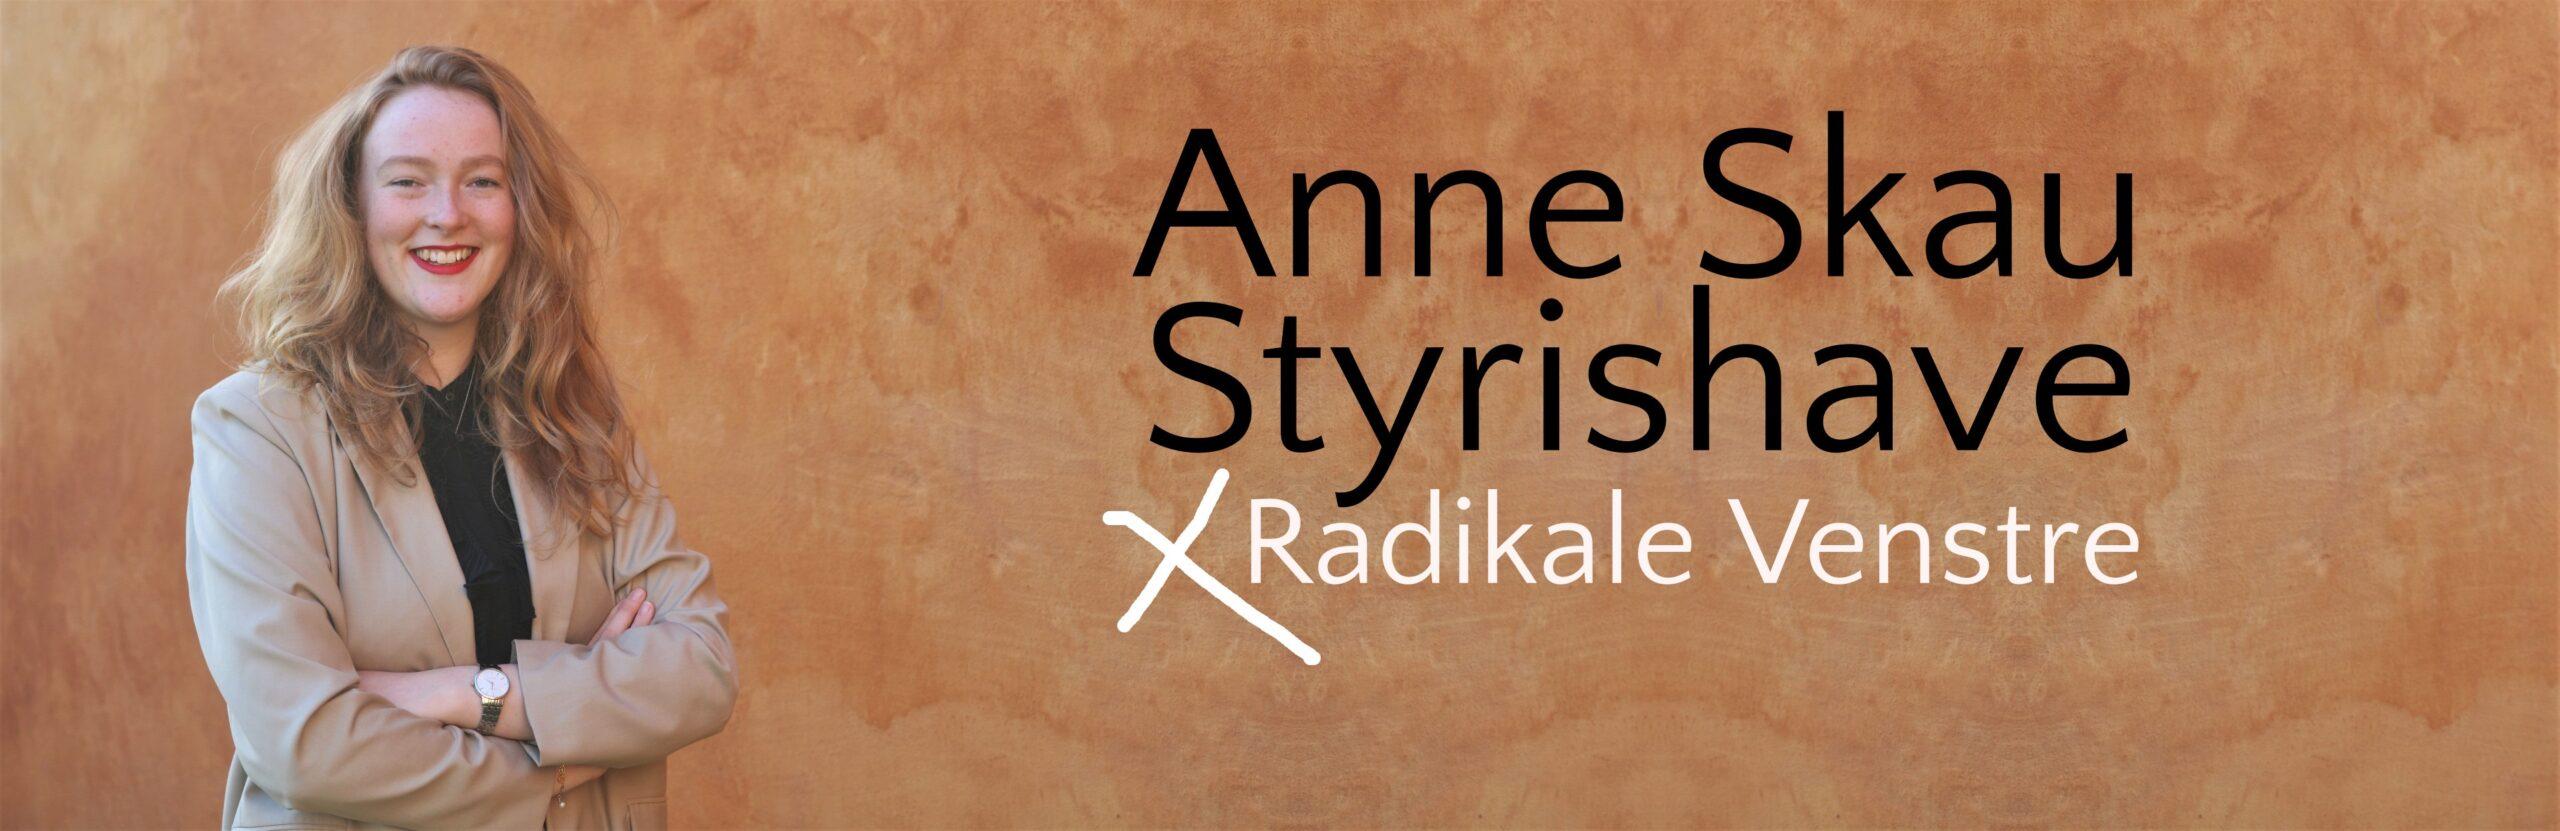 Anne Styrishave – radikale venstre